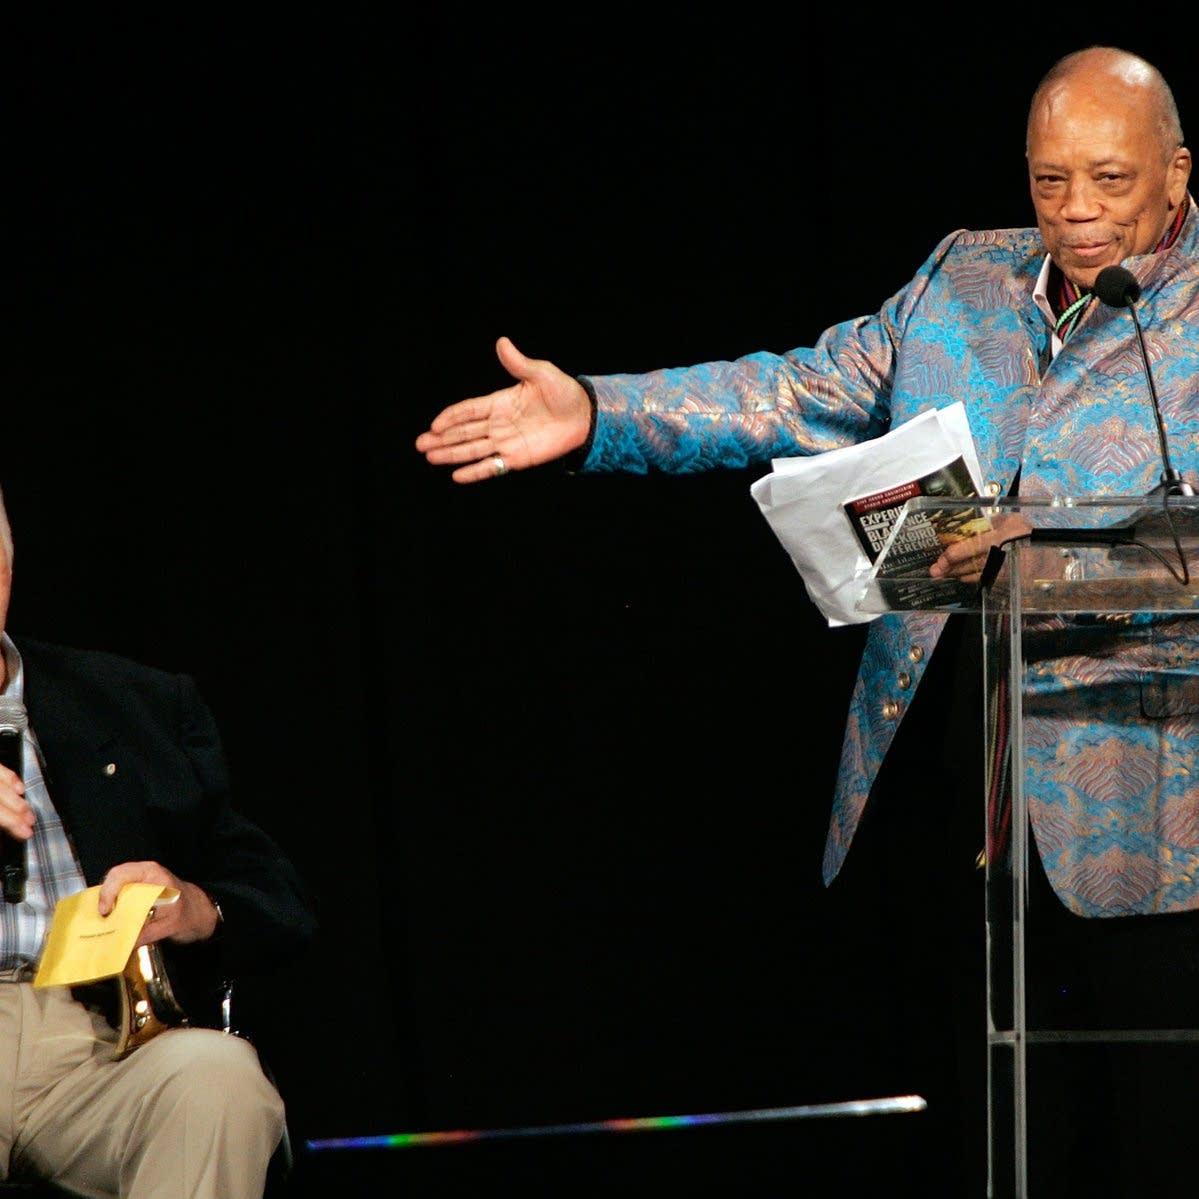 Bruce Swedien and Quincy Jones onstage together